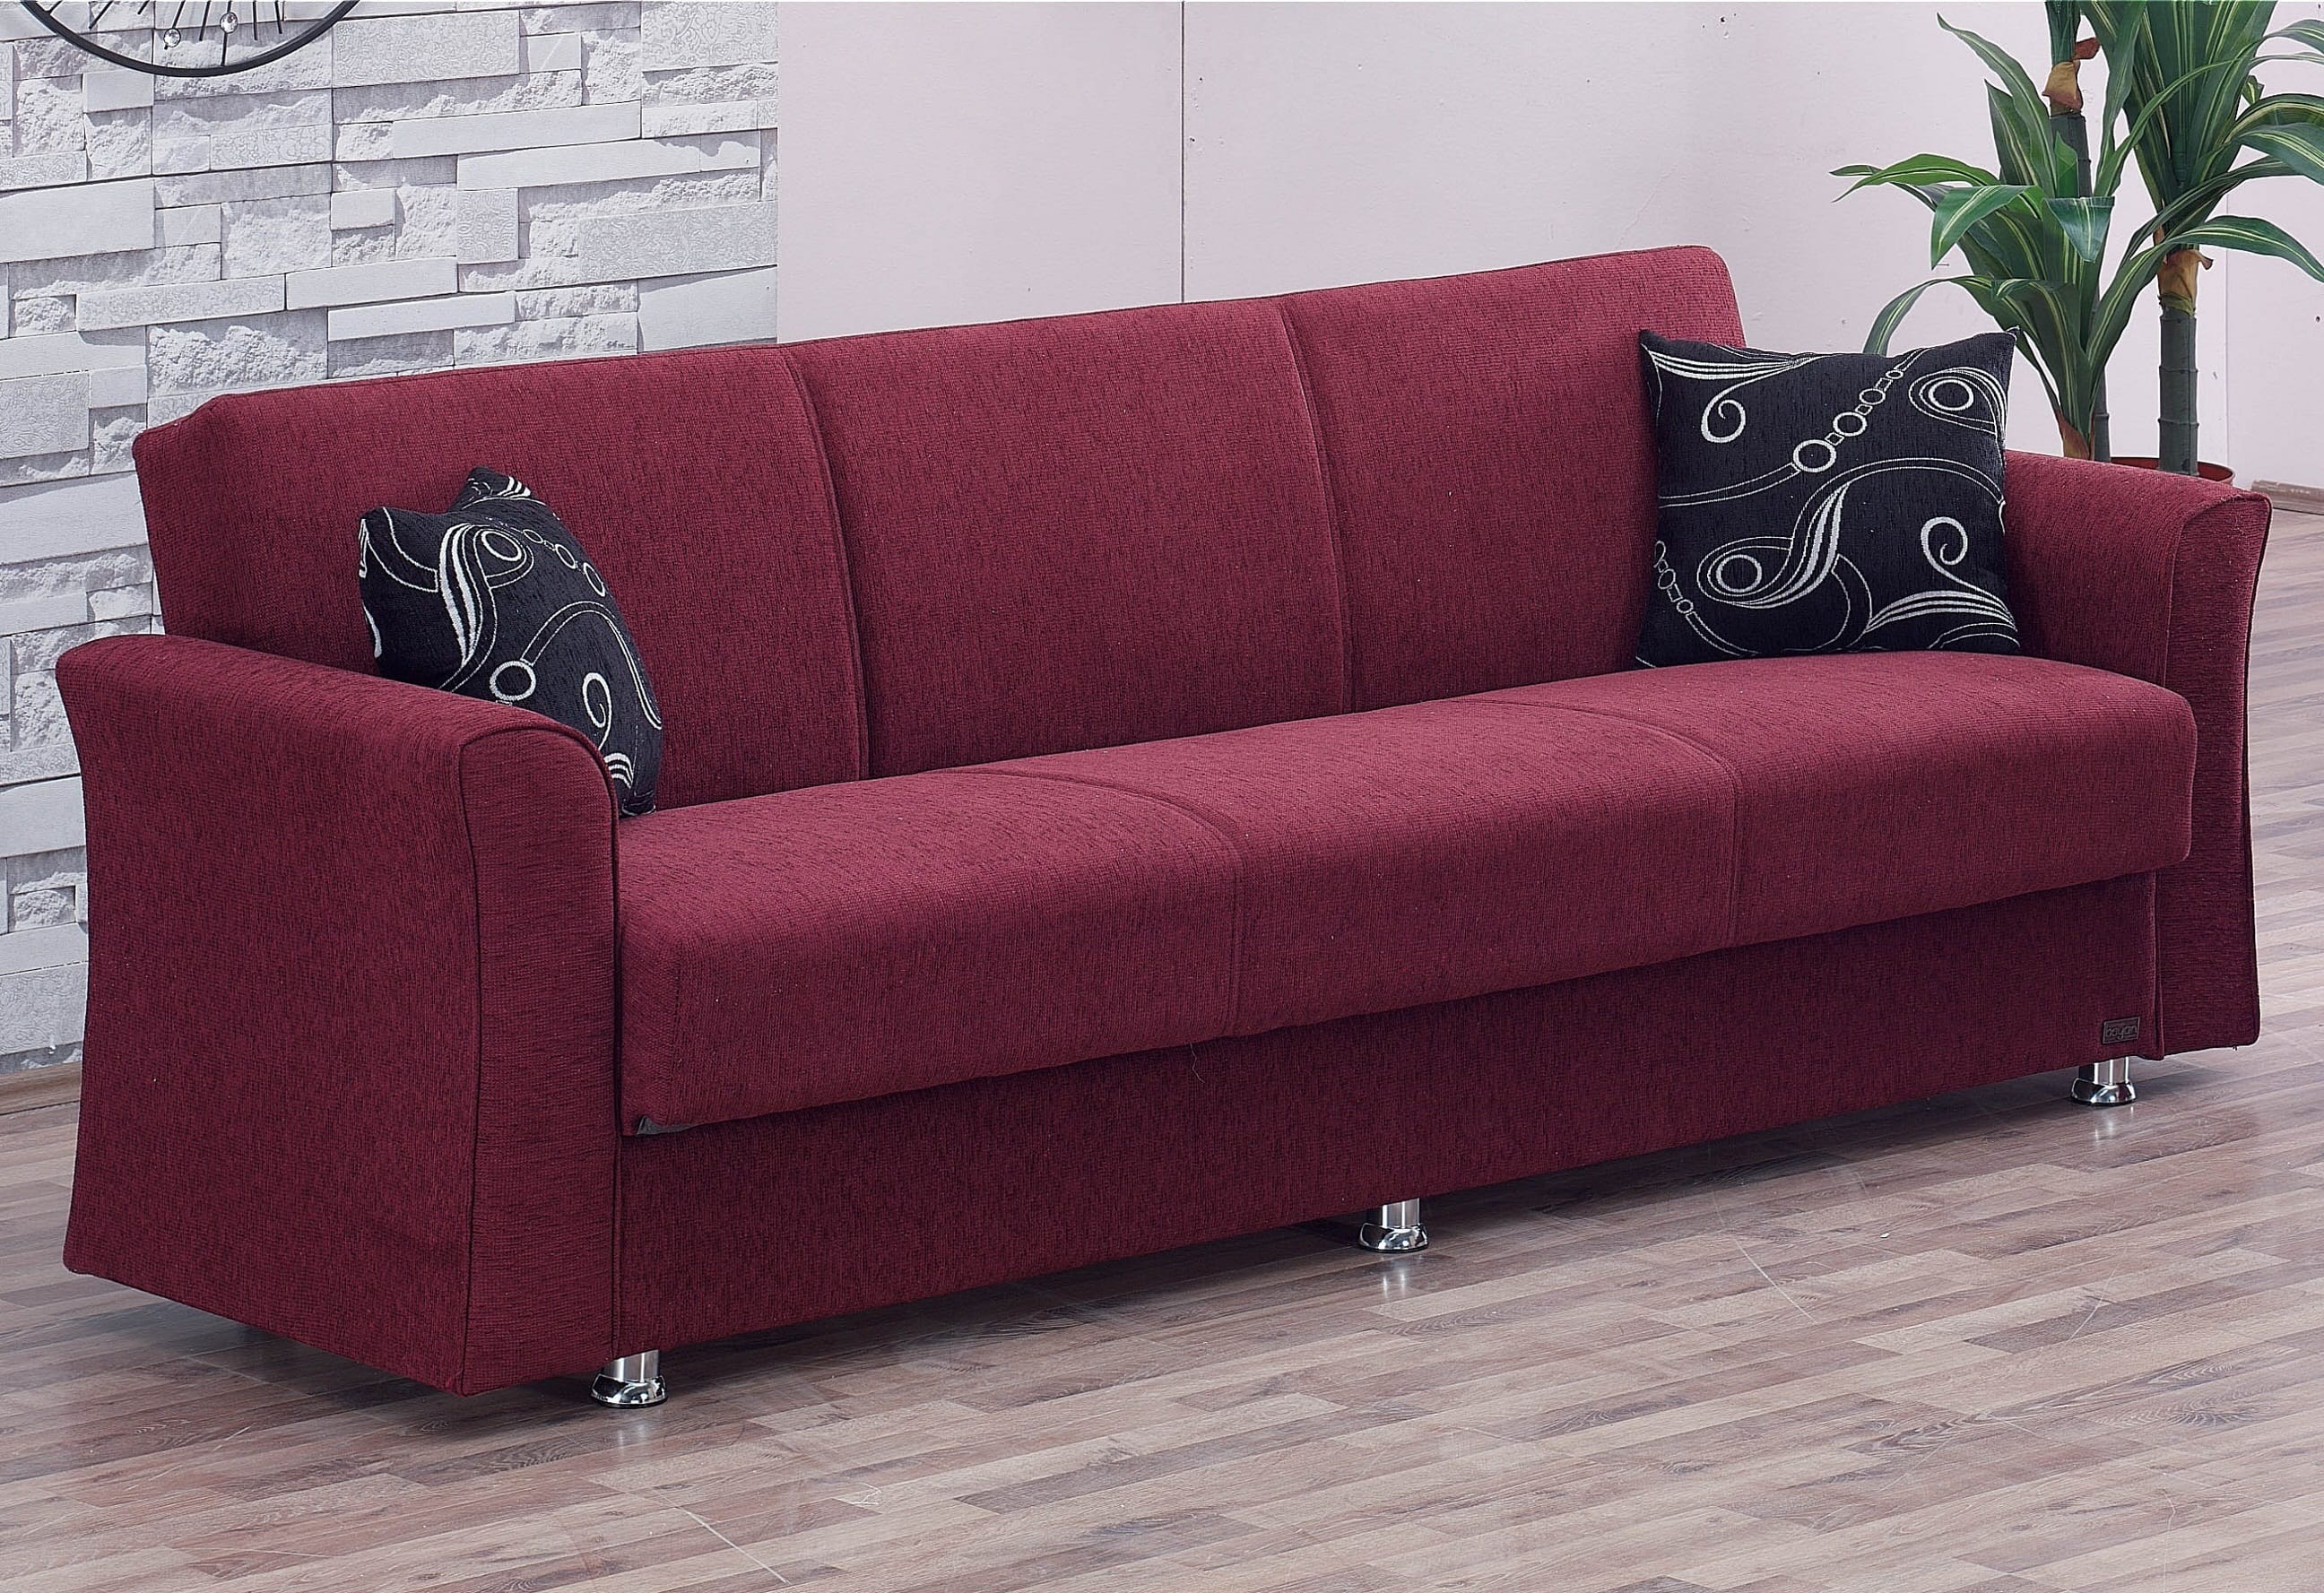 Ohio Sofa Ohio Sofa Bohus Furniture Pinterest Living Rooms And Thesofa